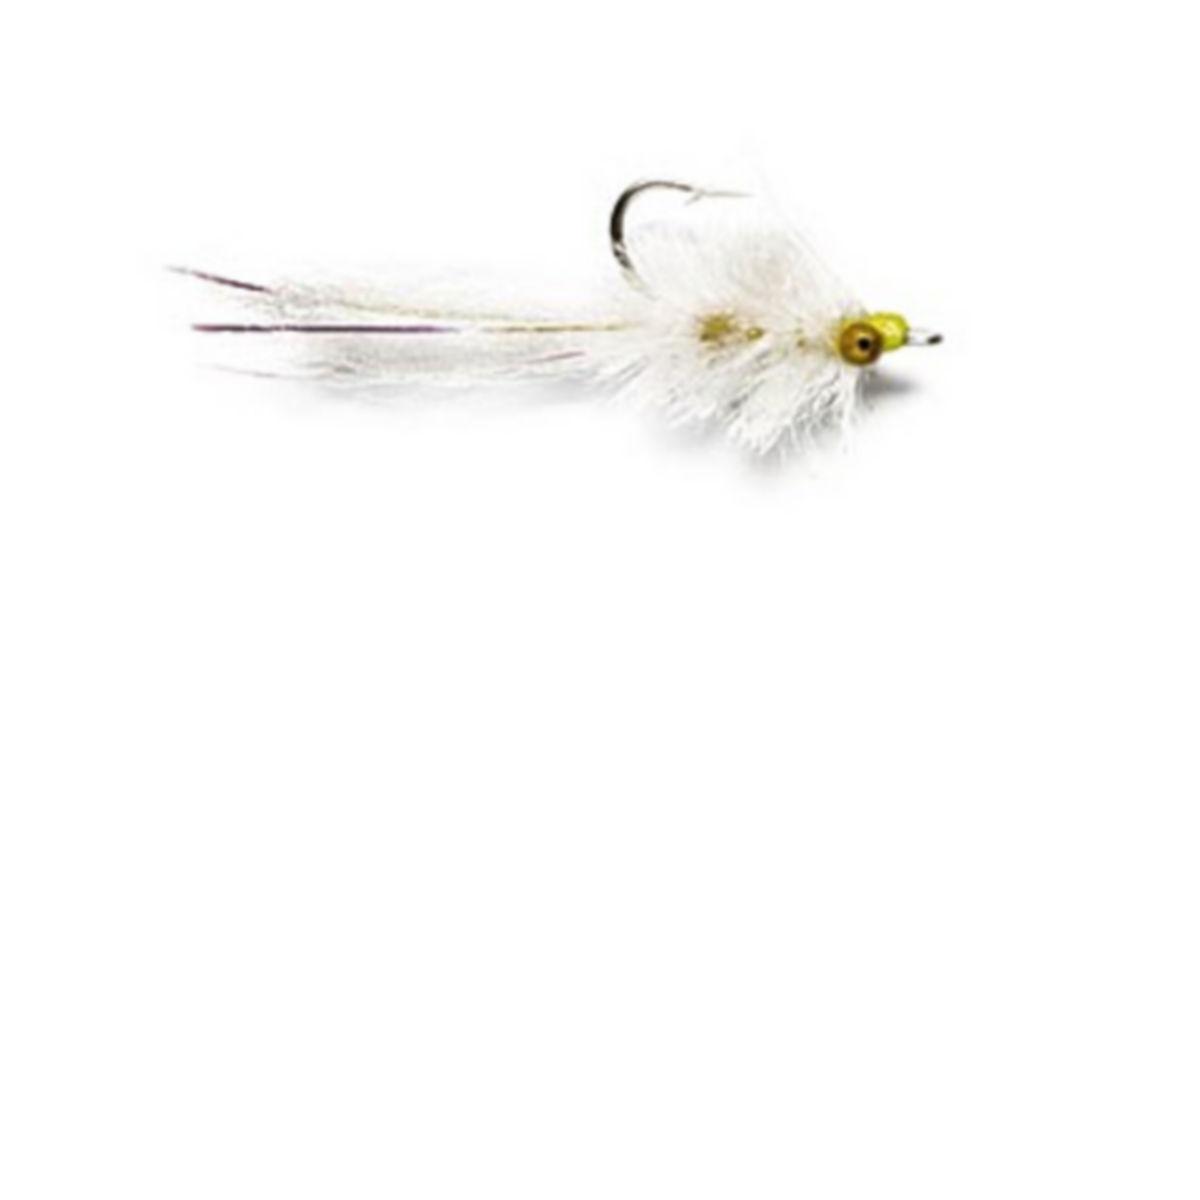 Grassett's Snook Minnow - image number 0